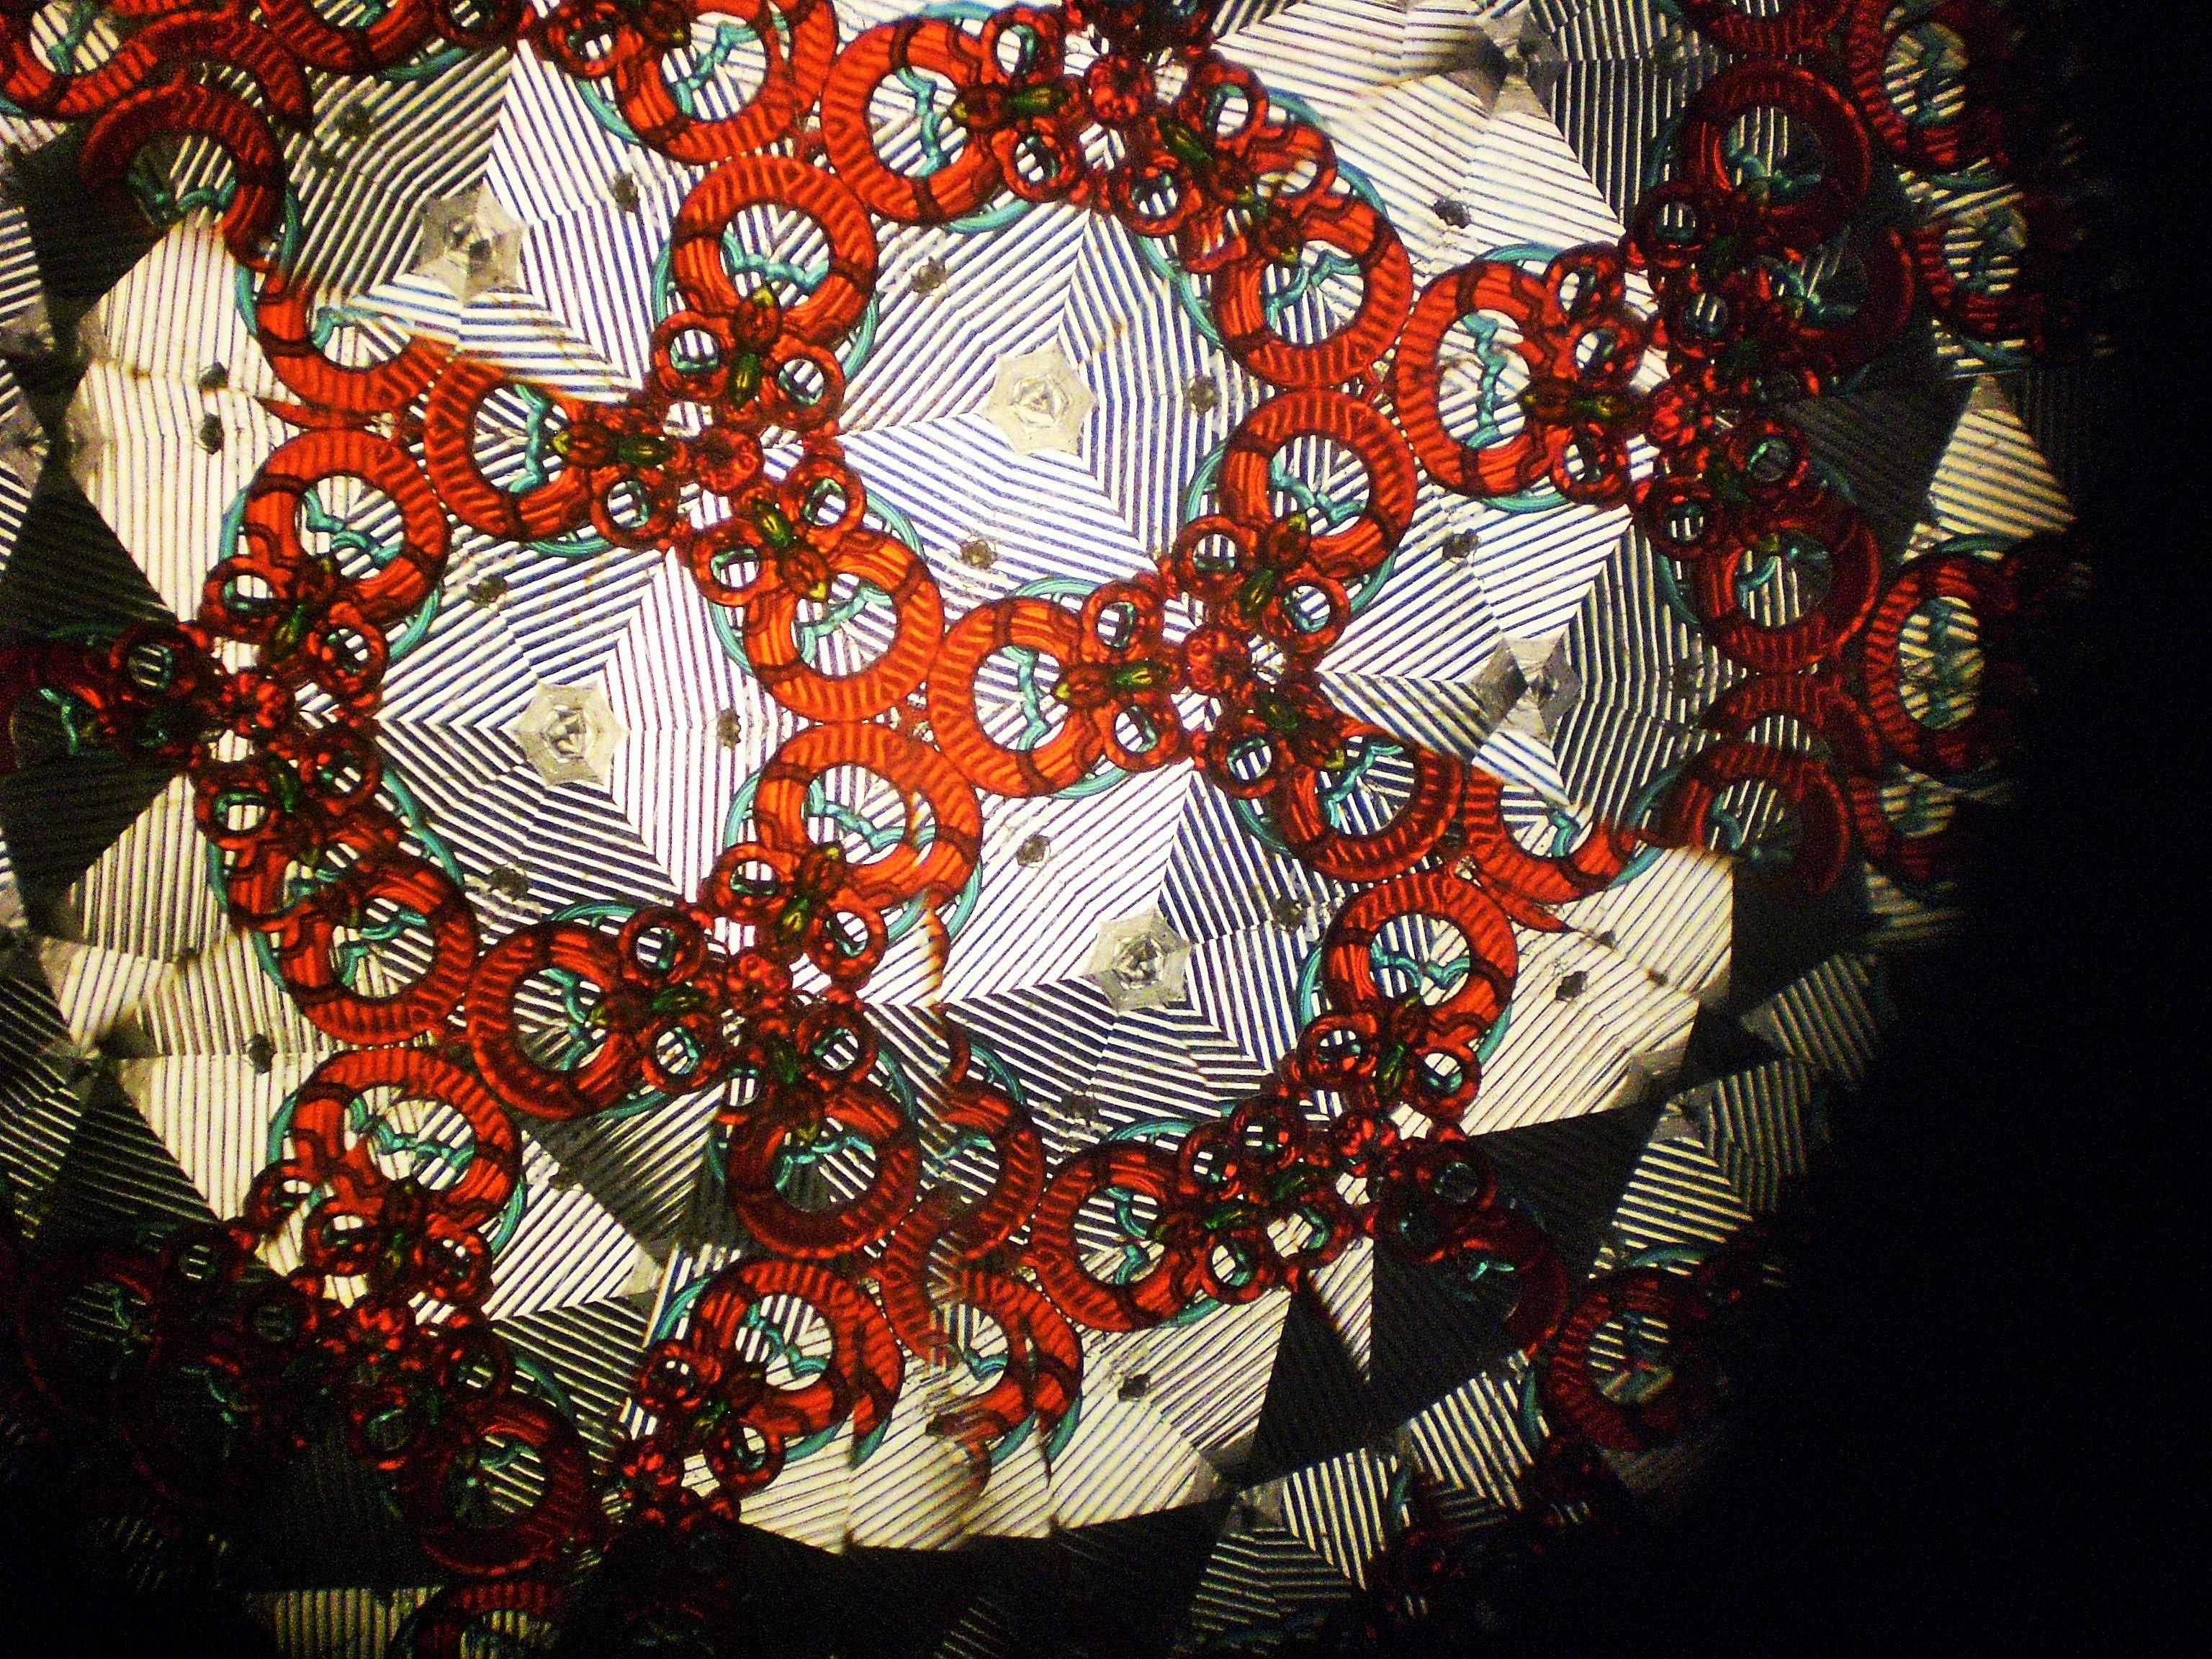 Kaleidoskop I, Sonja Grebe